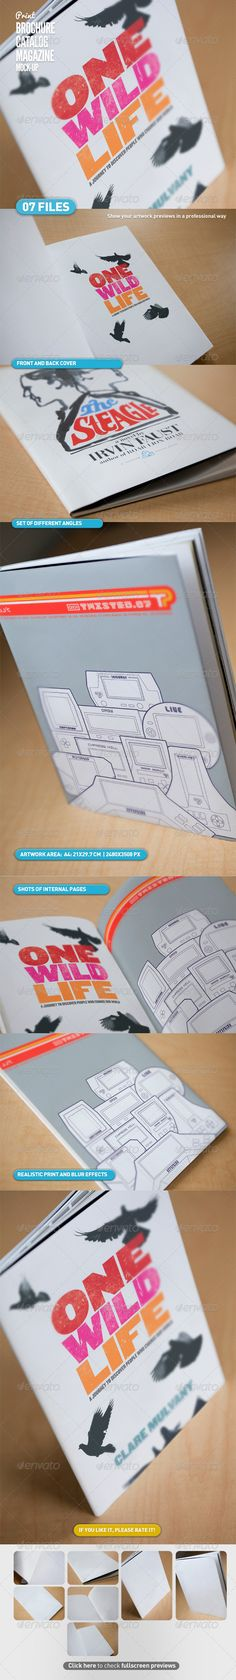 Catalogue/magazine mock-up - itscroma on graphicriver $8